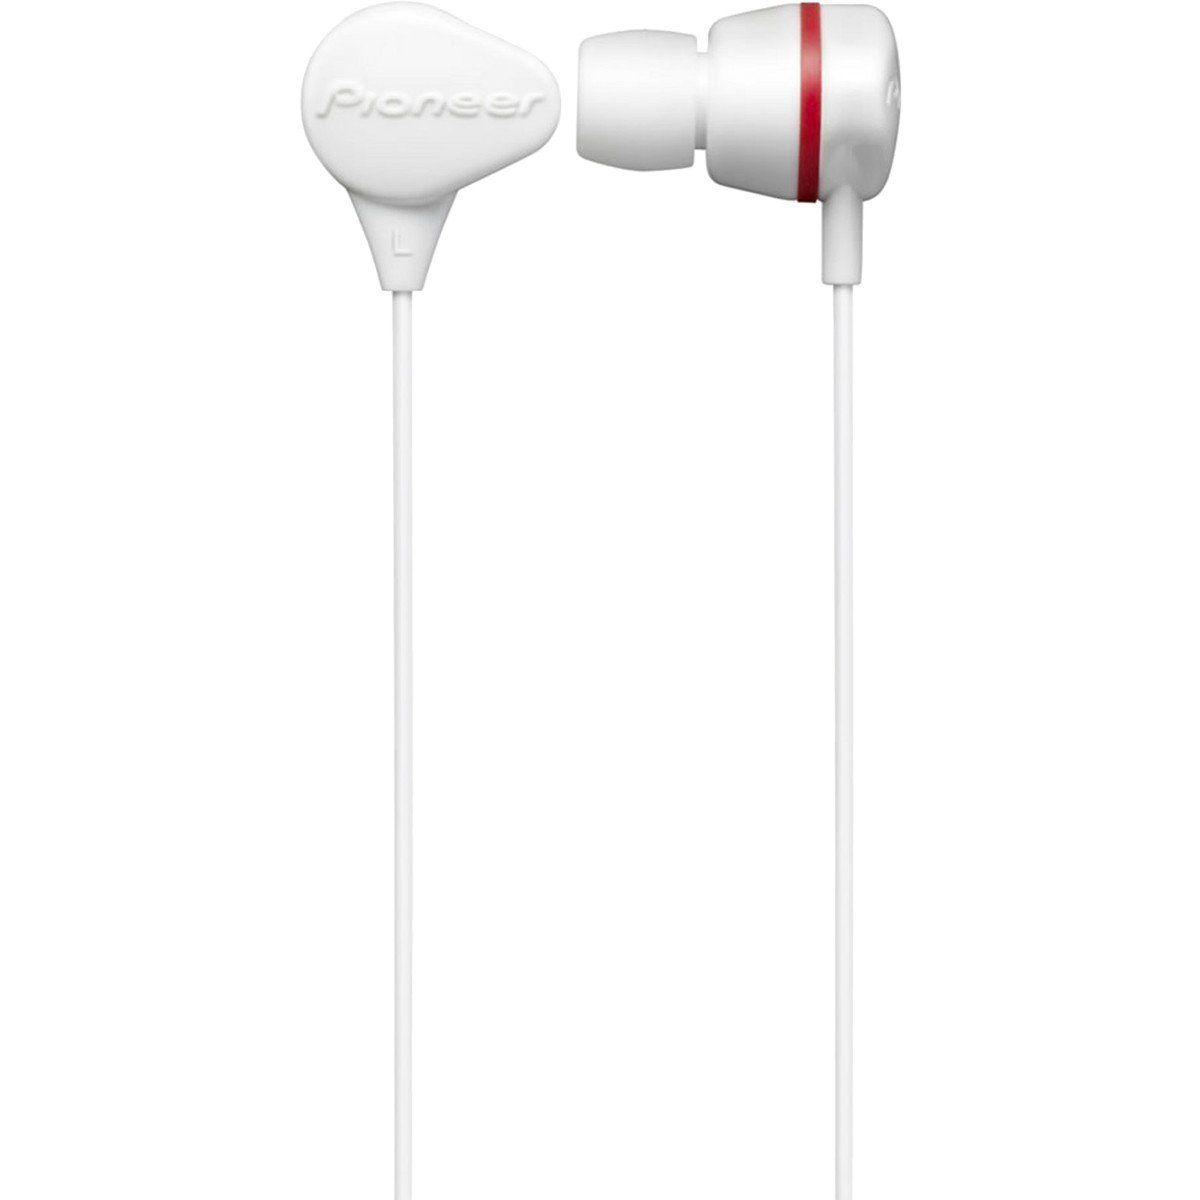 Pioneer SE-CL331 Fone de Ouvido SE CL 331 In-Ear à Prova D'água Ideal para Esportes